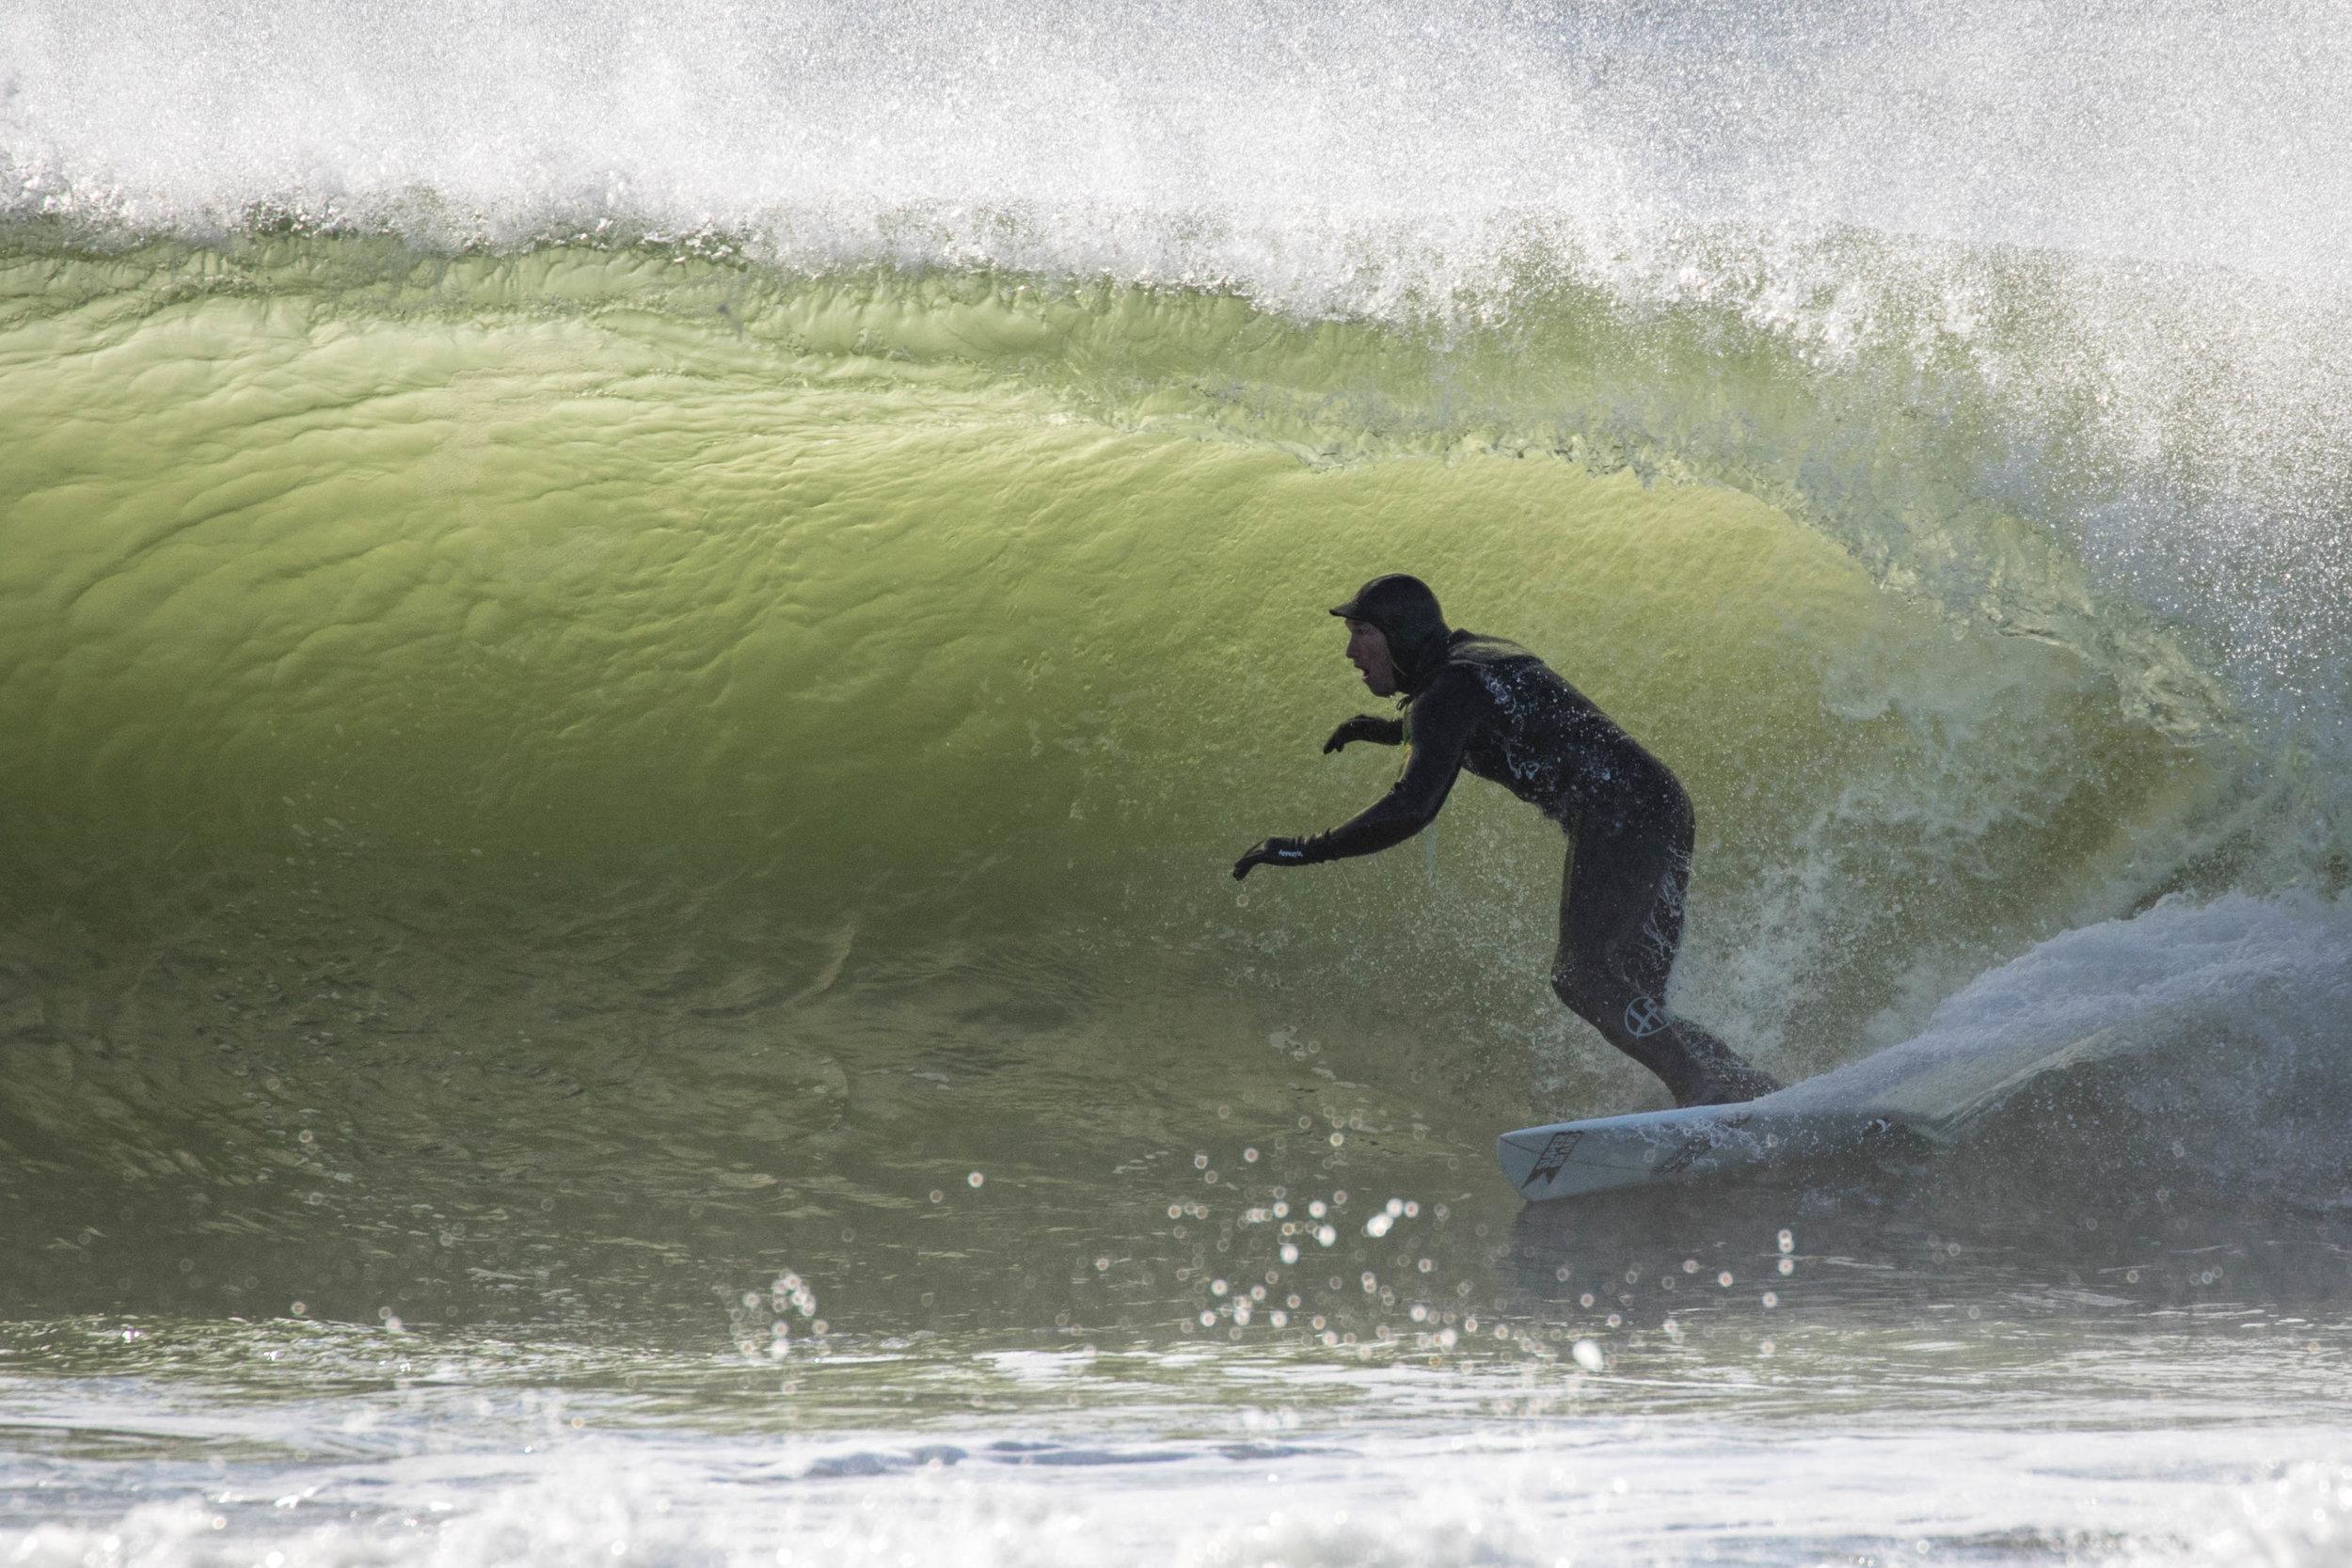 4-26-18 Mantoloking Wave 29.jpg